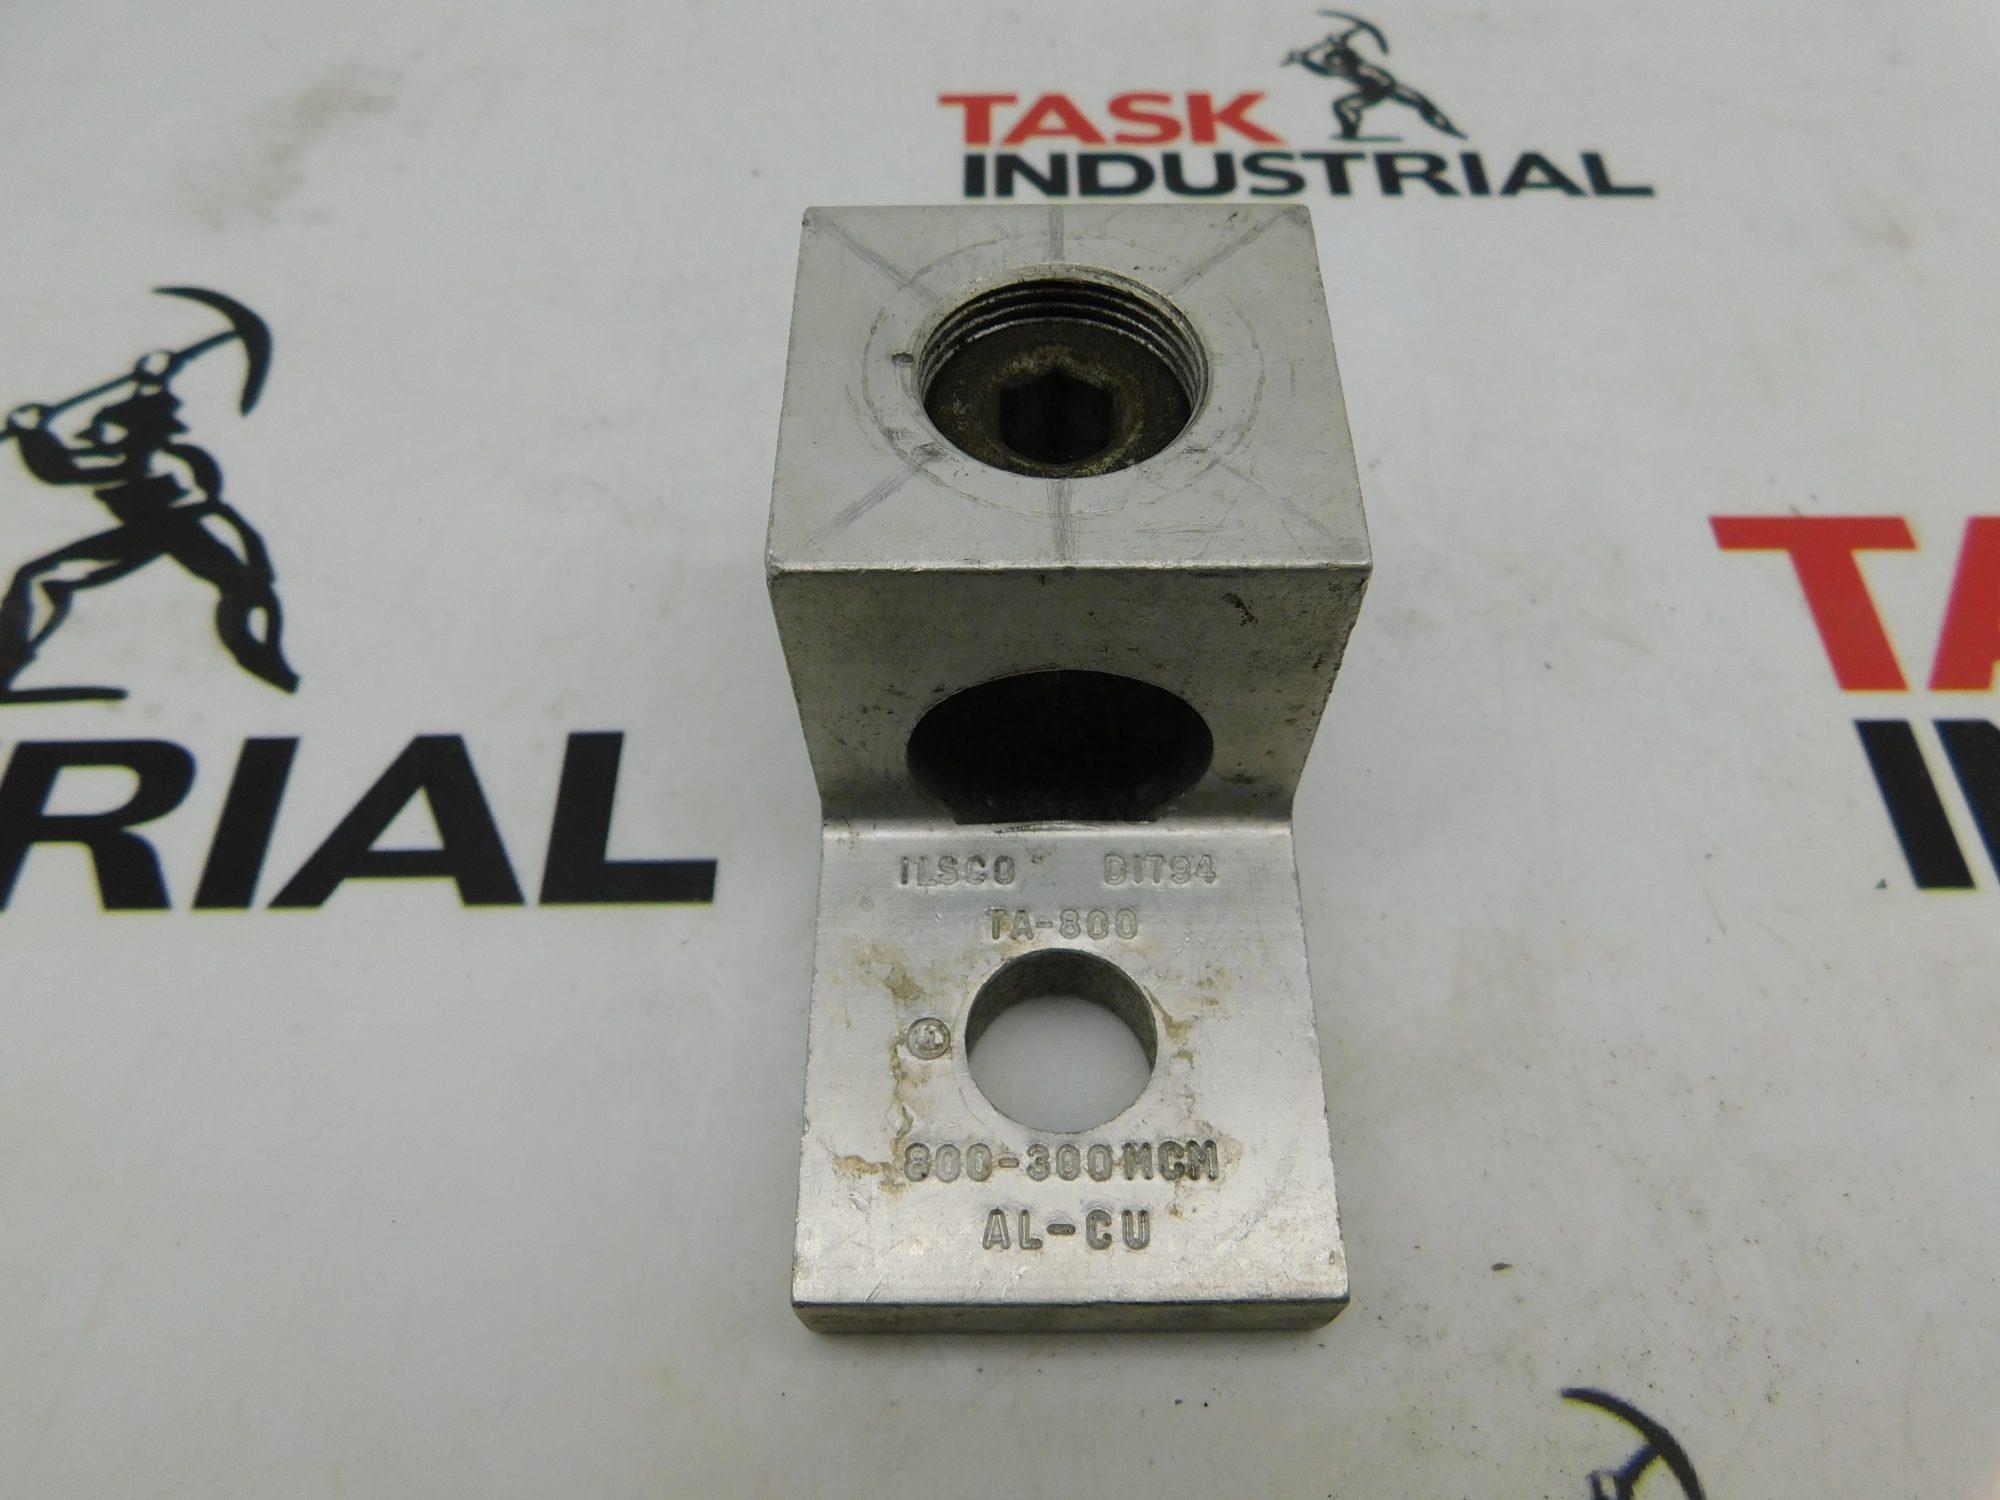 Ilsco Lug Terminal TA-800/D1794/AL-CU